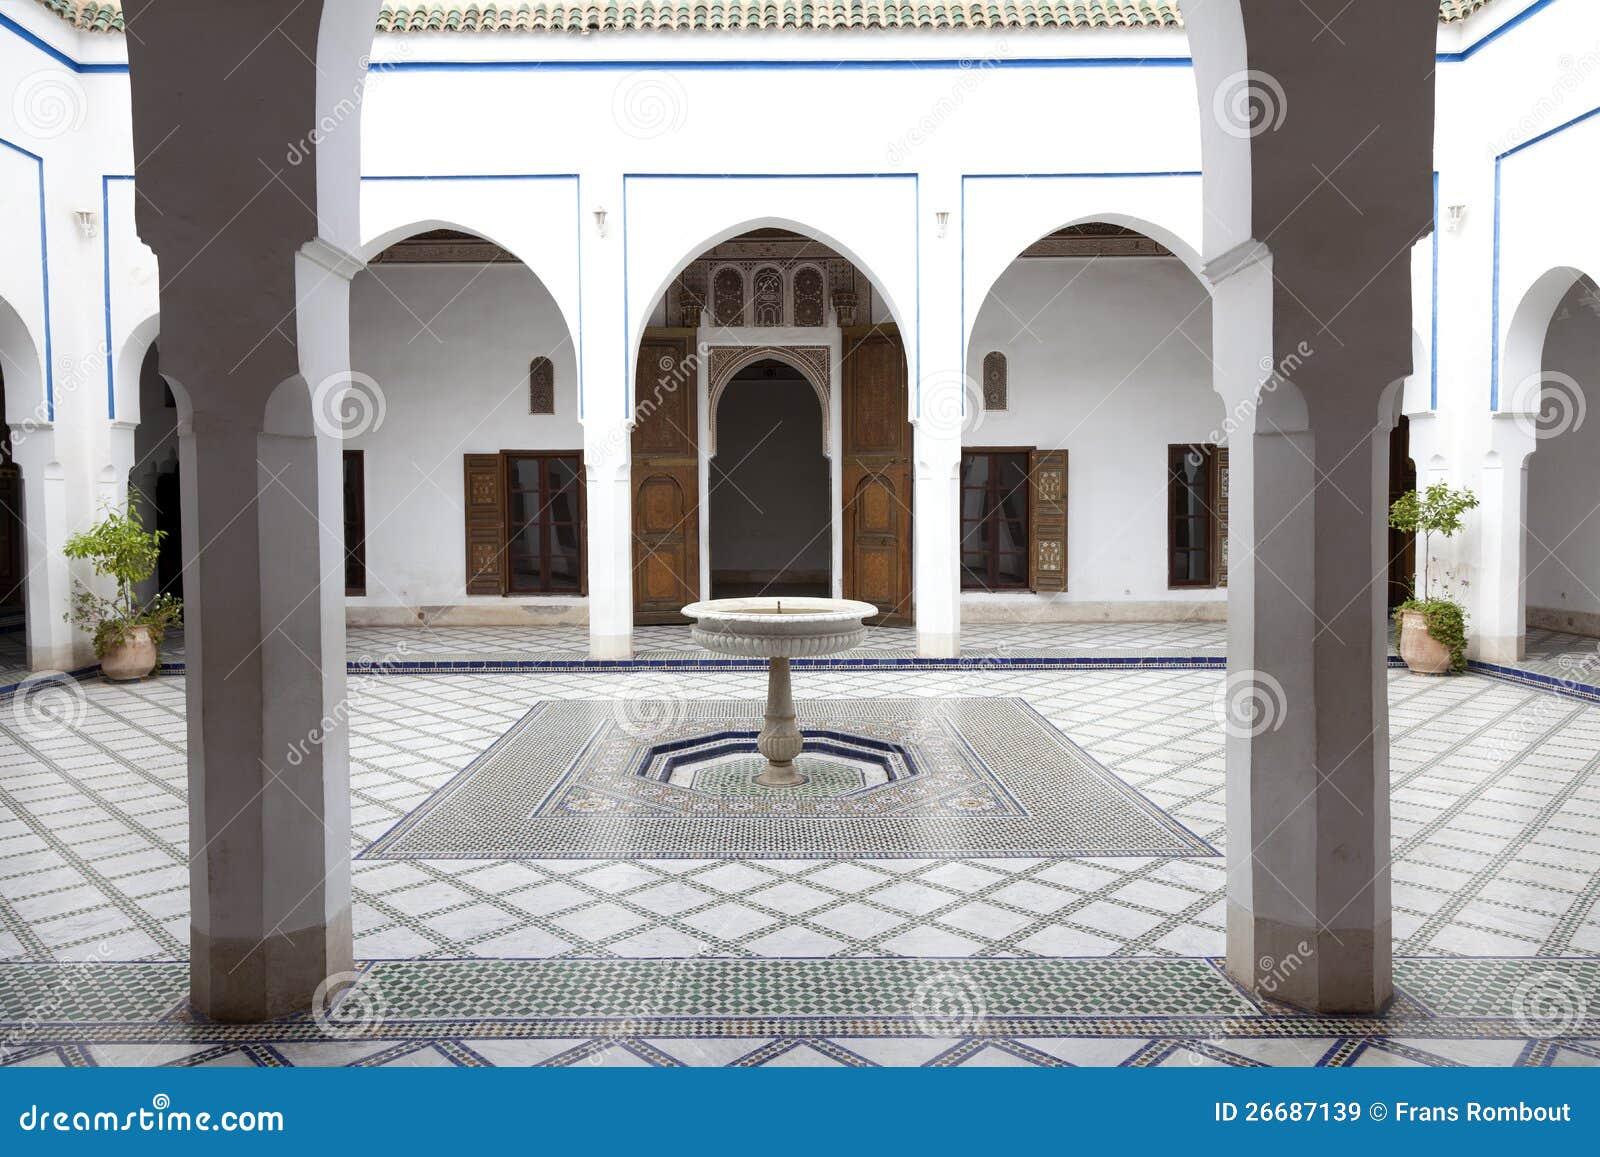 Palais de la的巴伊亚马拉喀什摩洛哥庭院